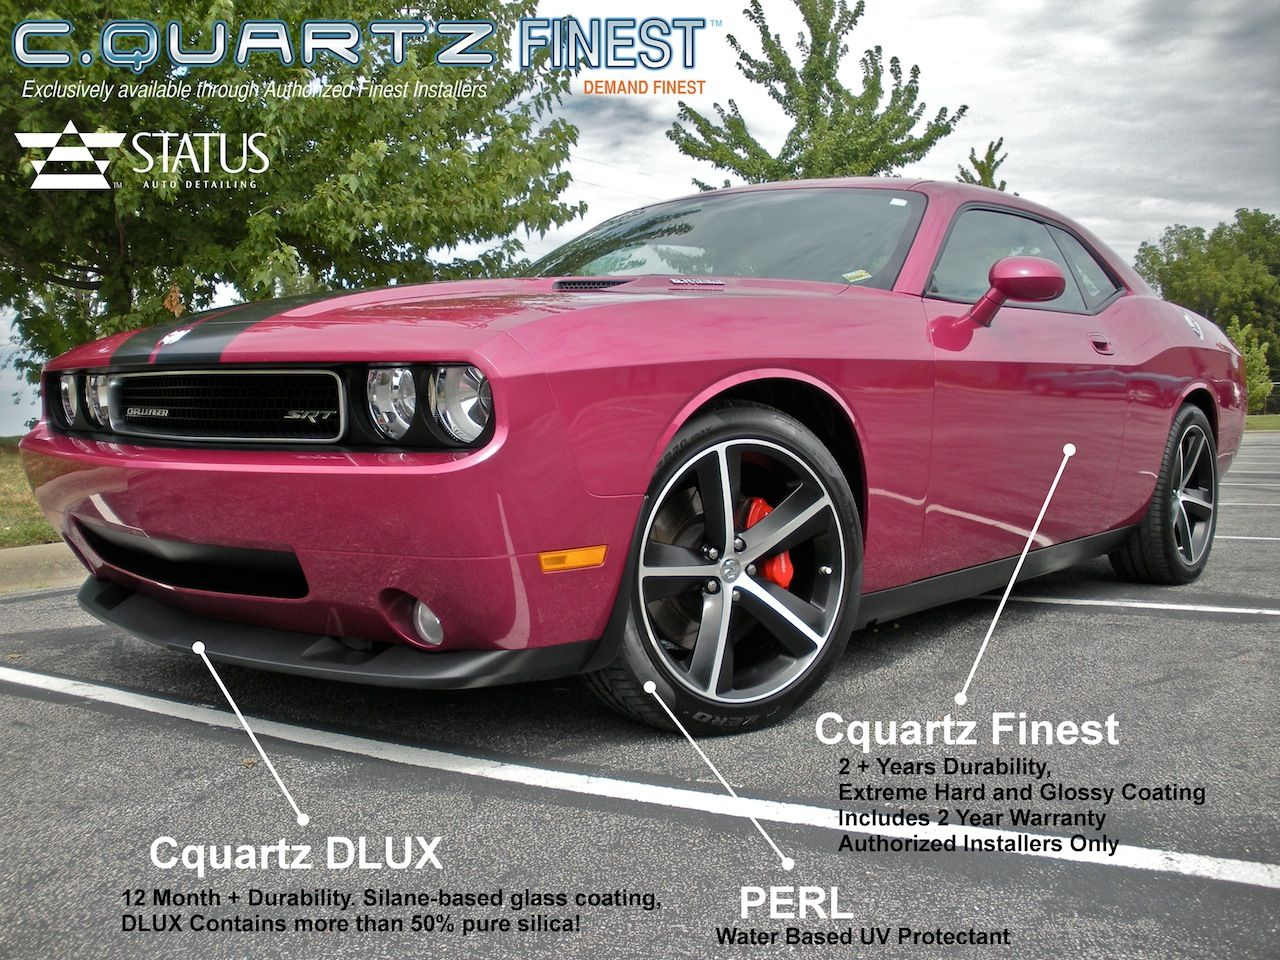 Dodge Challenger With Cquartz Finest Cquartz Dlux And Carpro Perl Protectant Autodetailingspringfieldmo Cquar Springfield Missouri Car Detailing Springfield